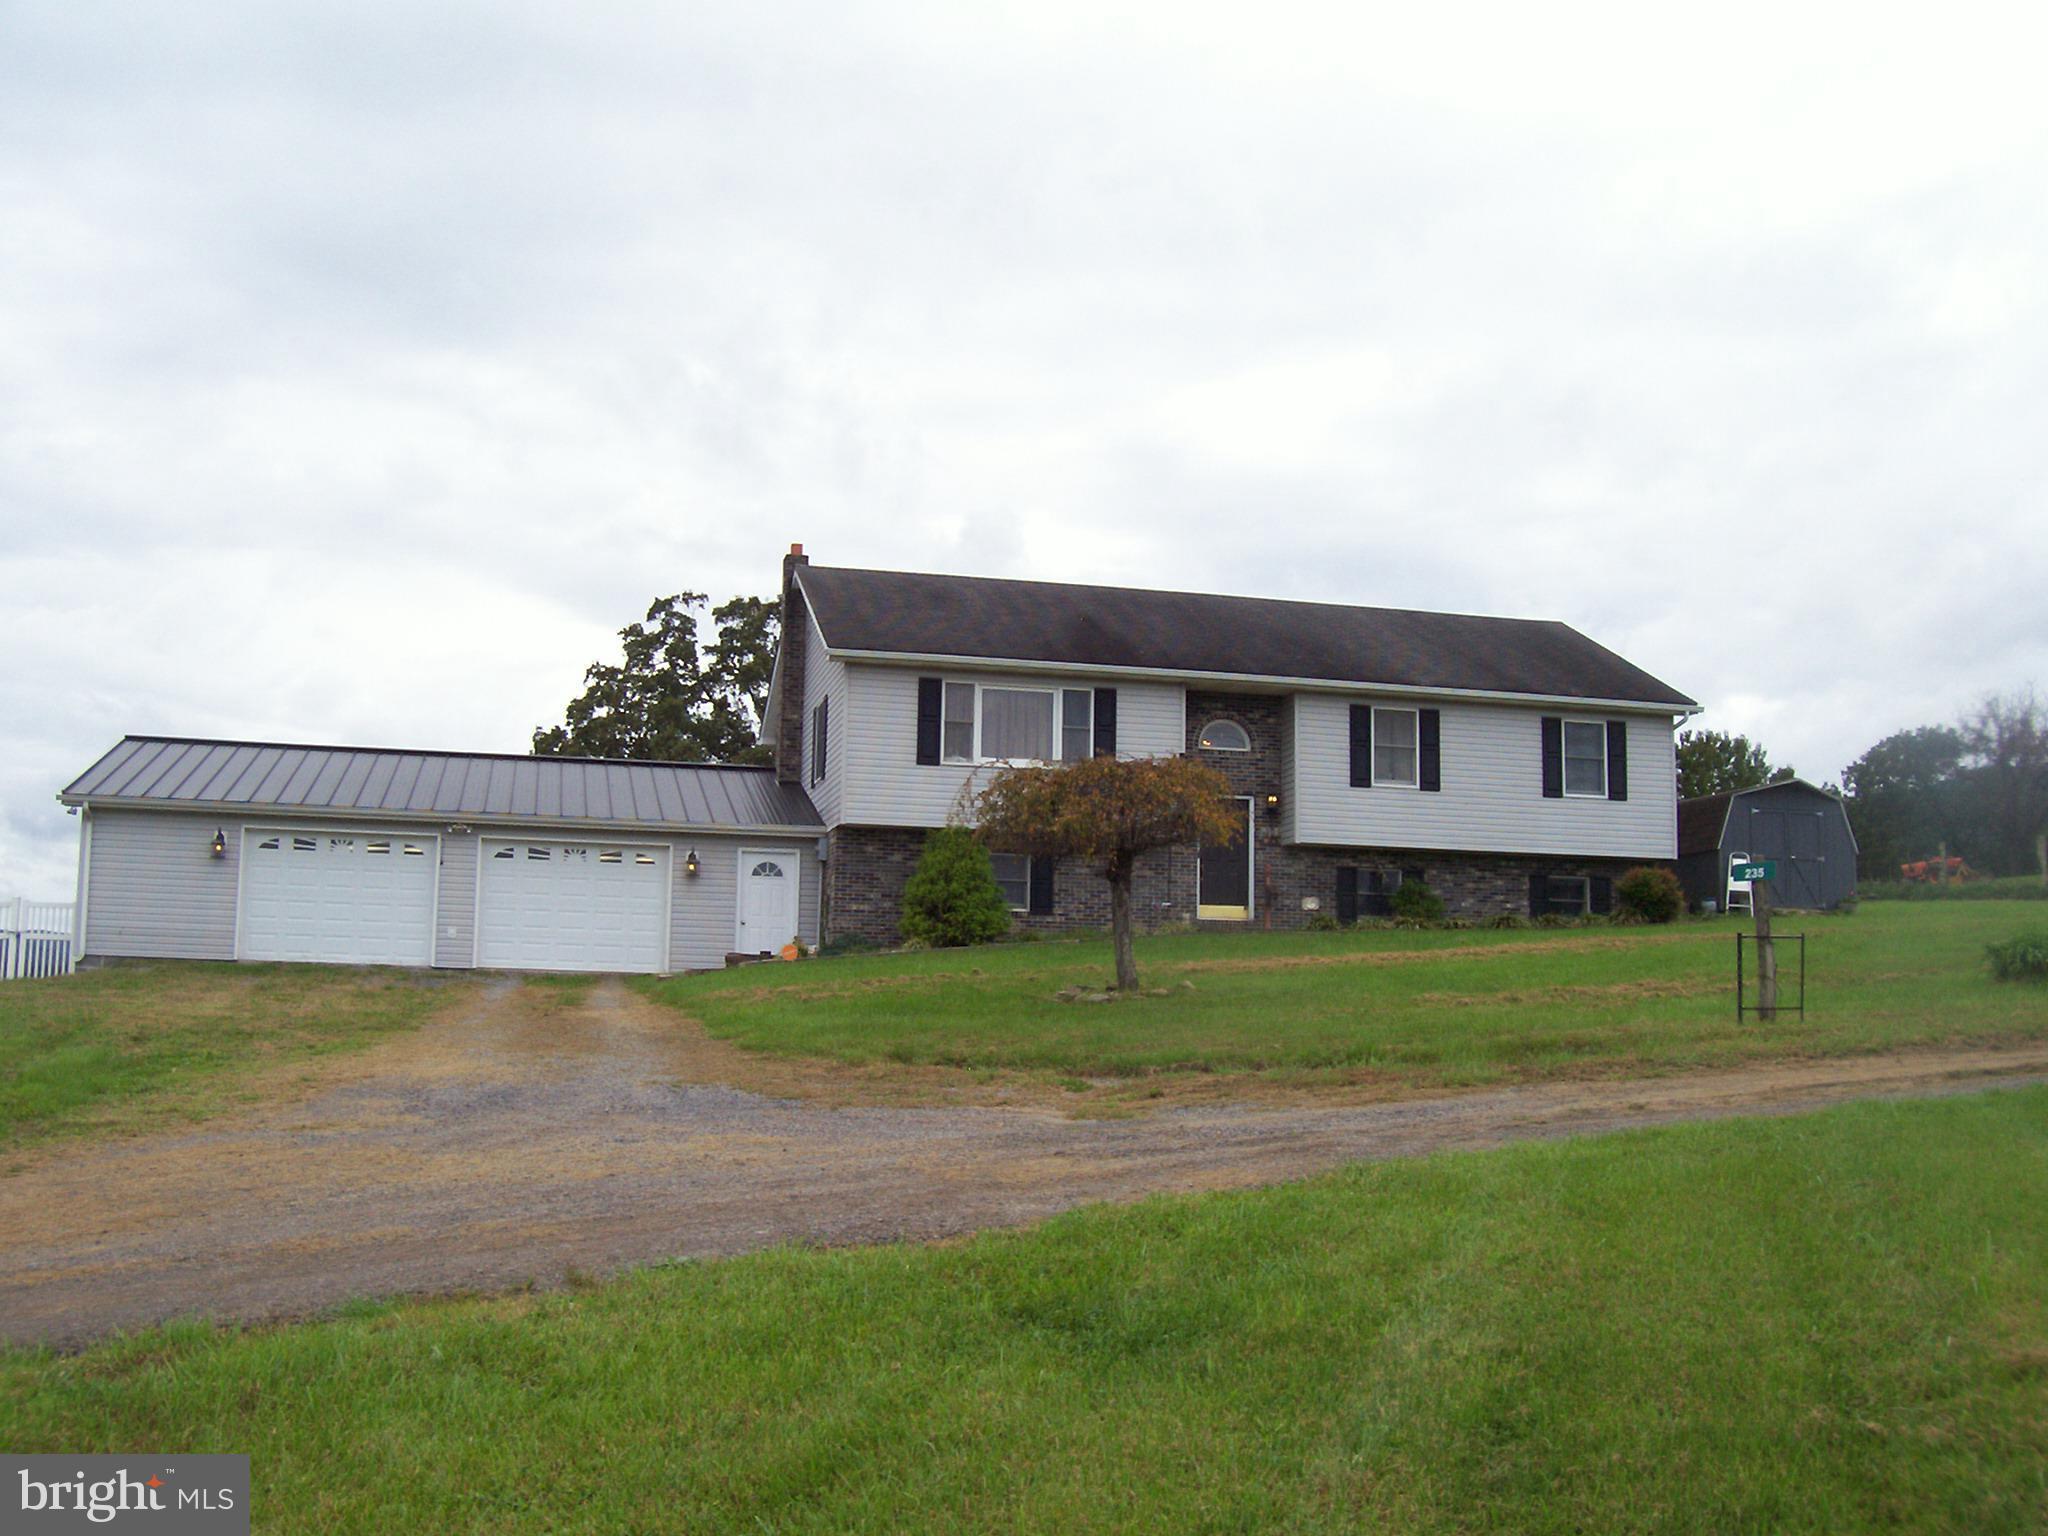 235 FORSYTHIA LANE S, PETERSBURG, WV 26847